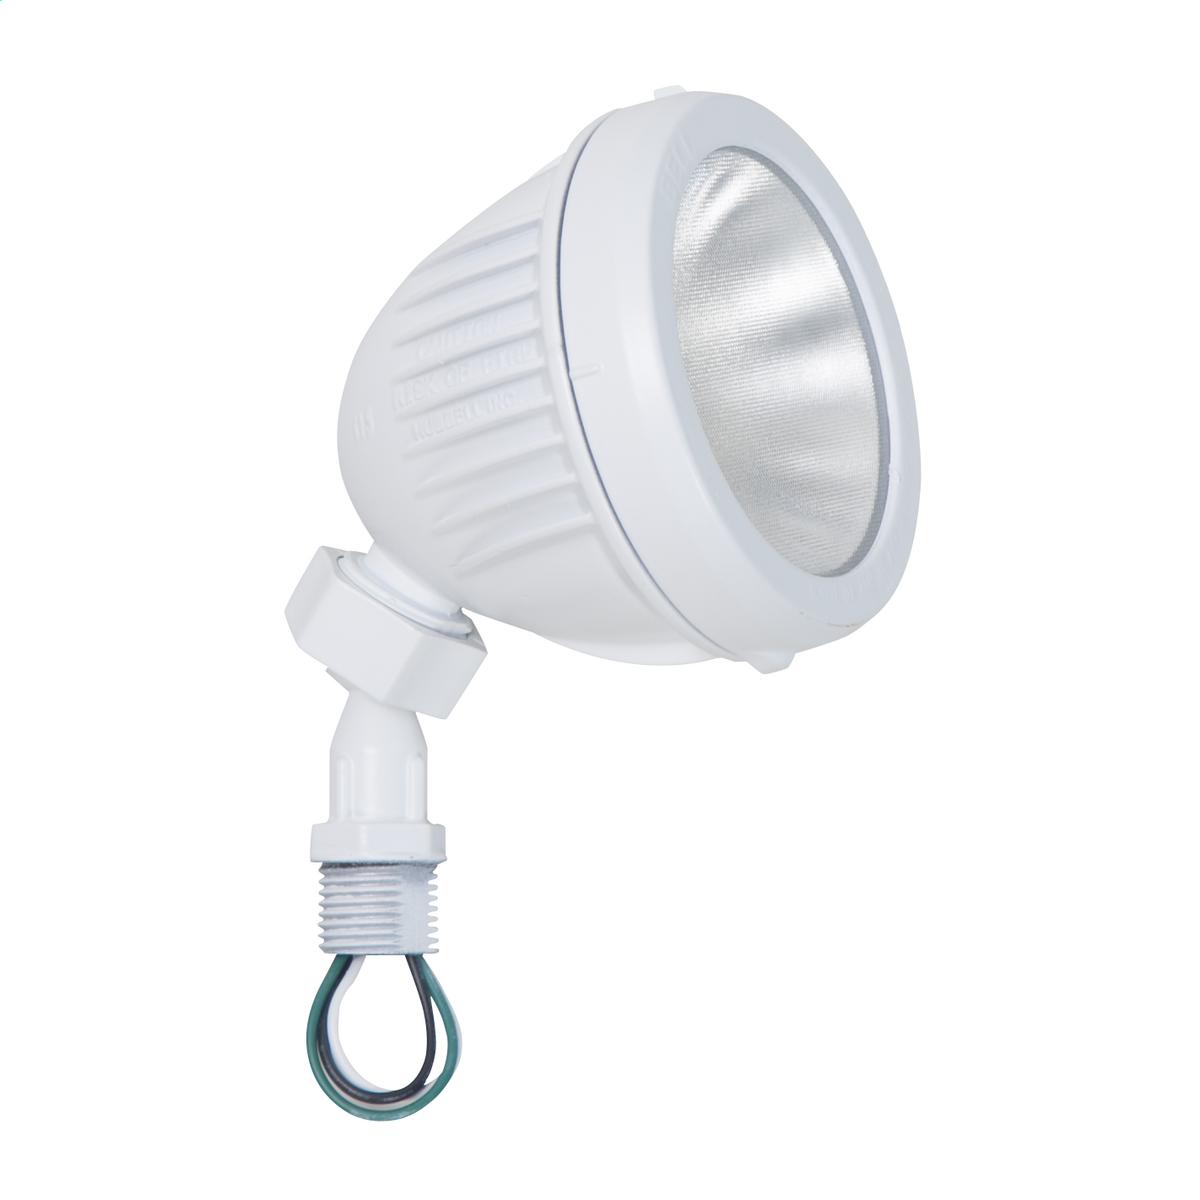 RAC LL1000W LED Swivel Floodlight/Lampholder 1000Lumen 13W - White CS=4